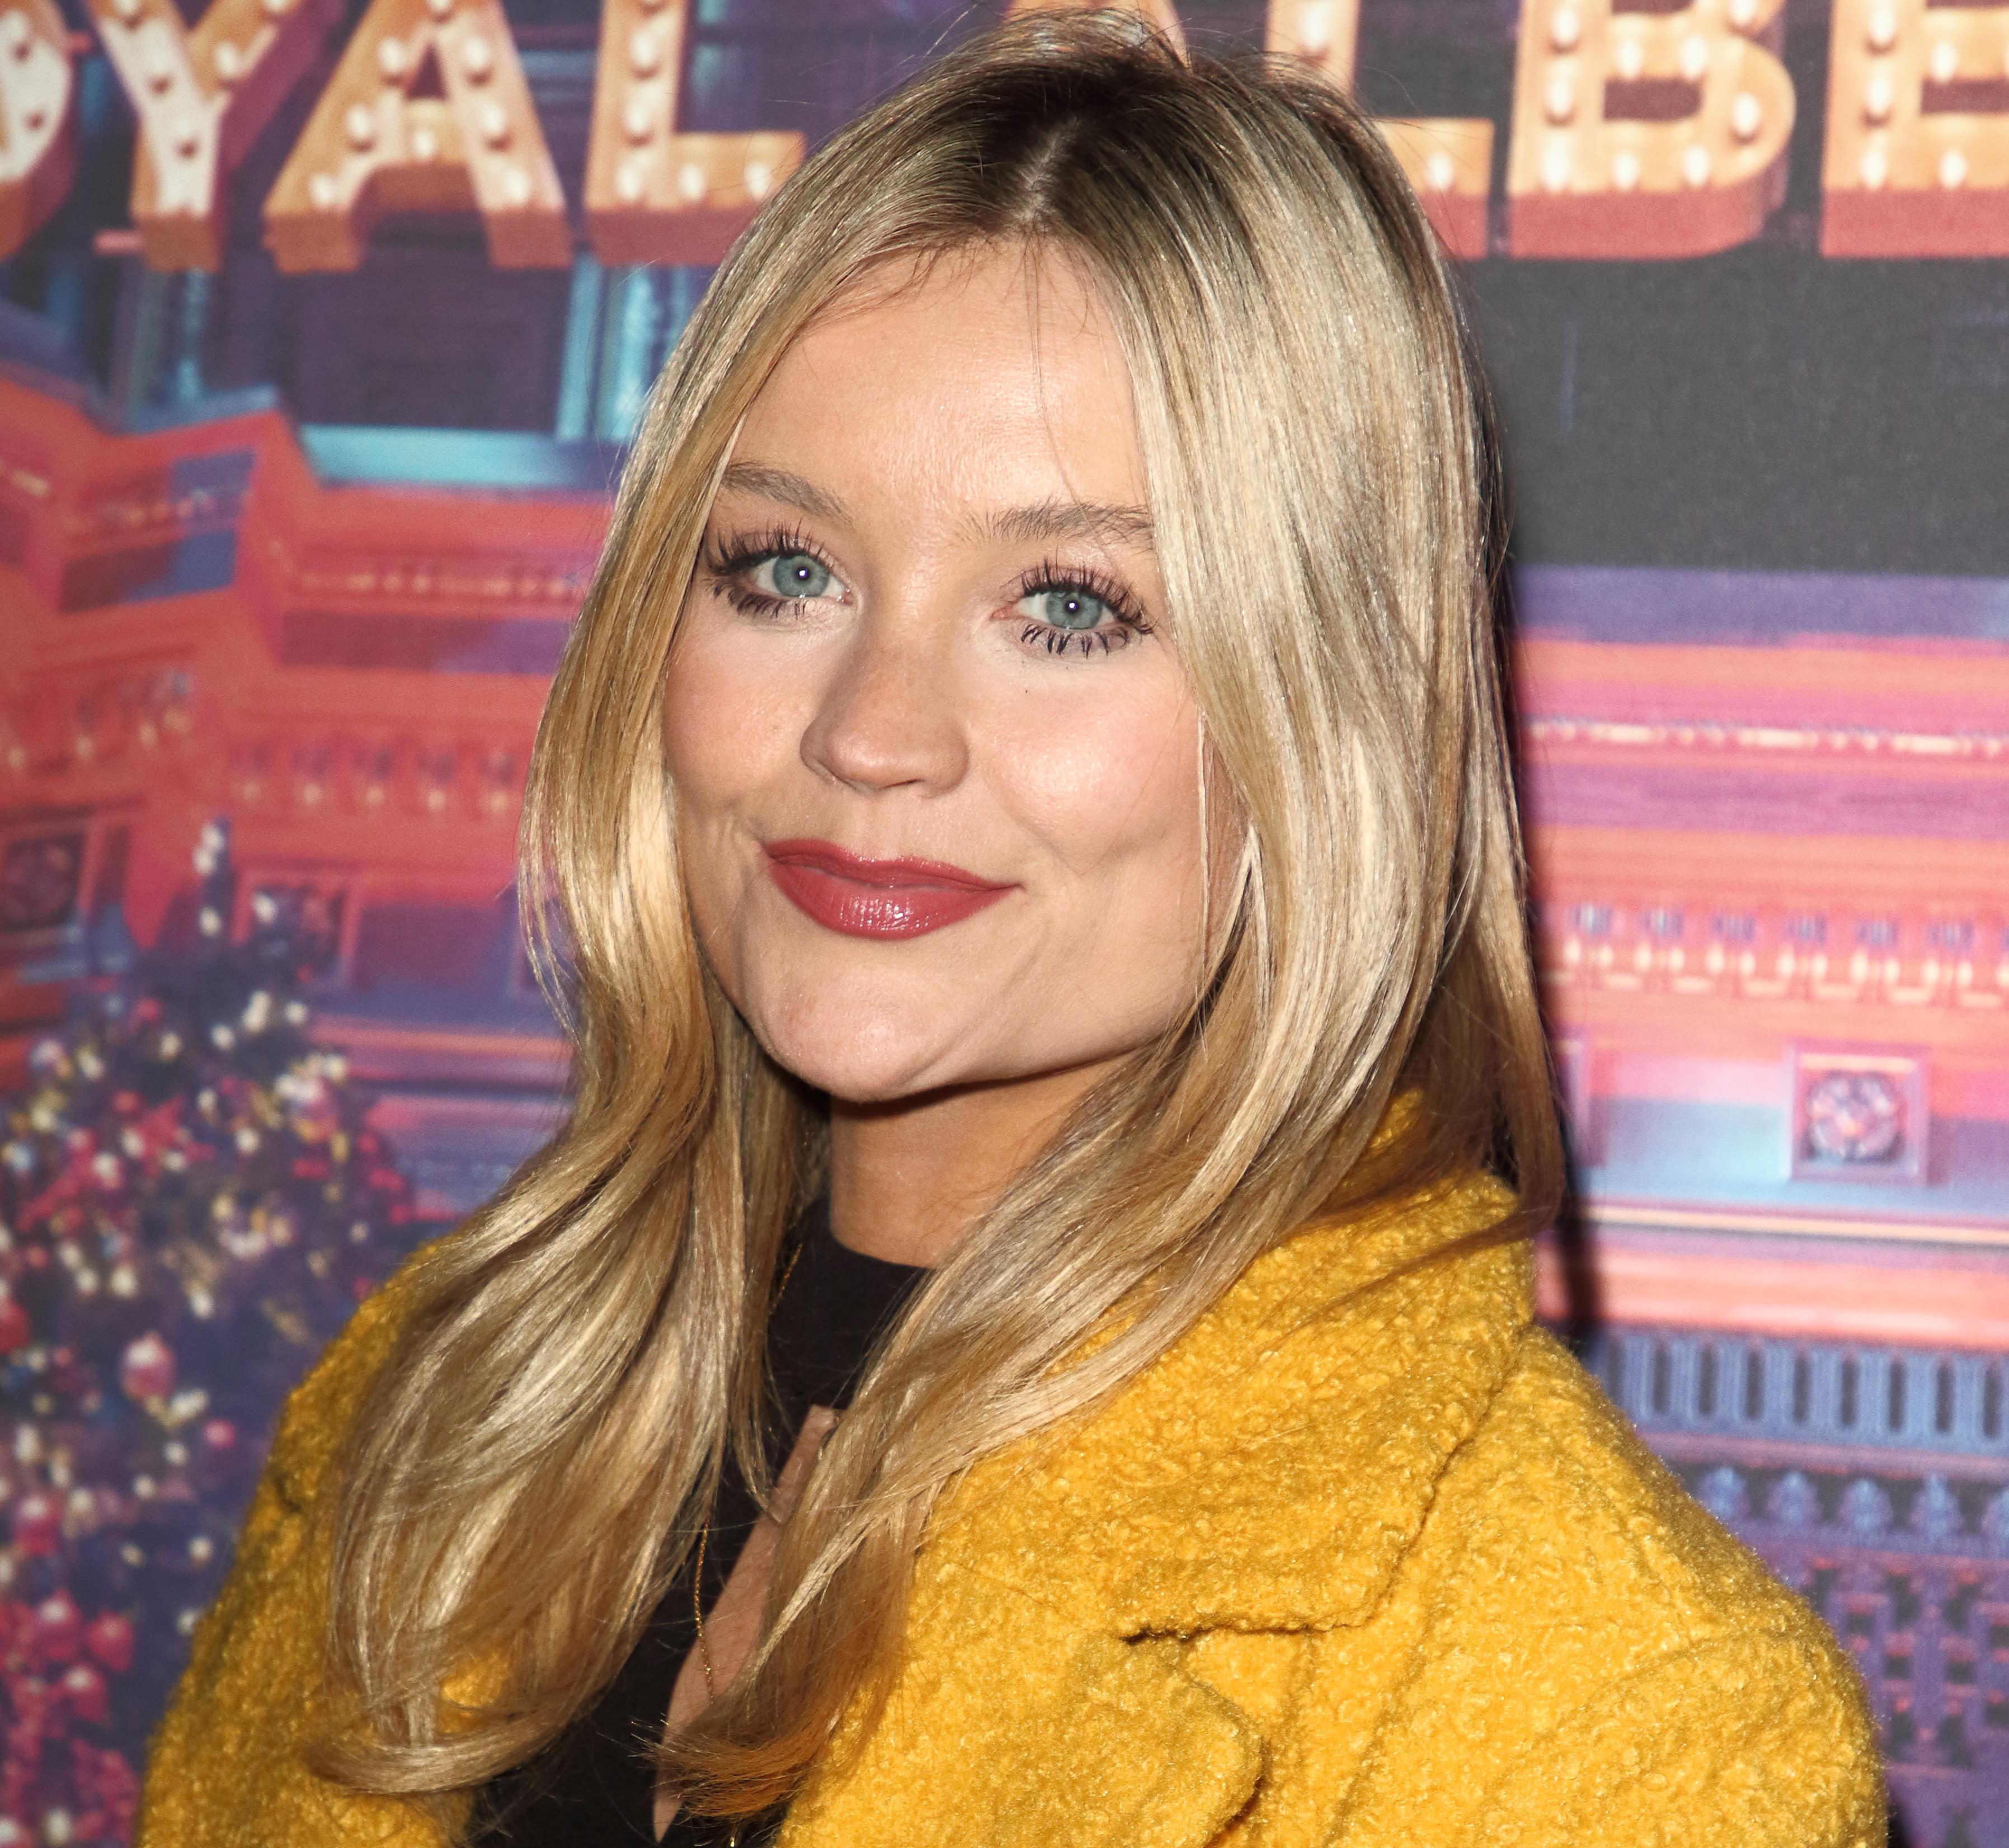 'Love Island' host Laura Whitmore calls out invasive paparazzi following Caroline Flack's death